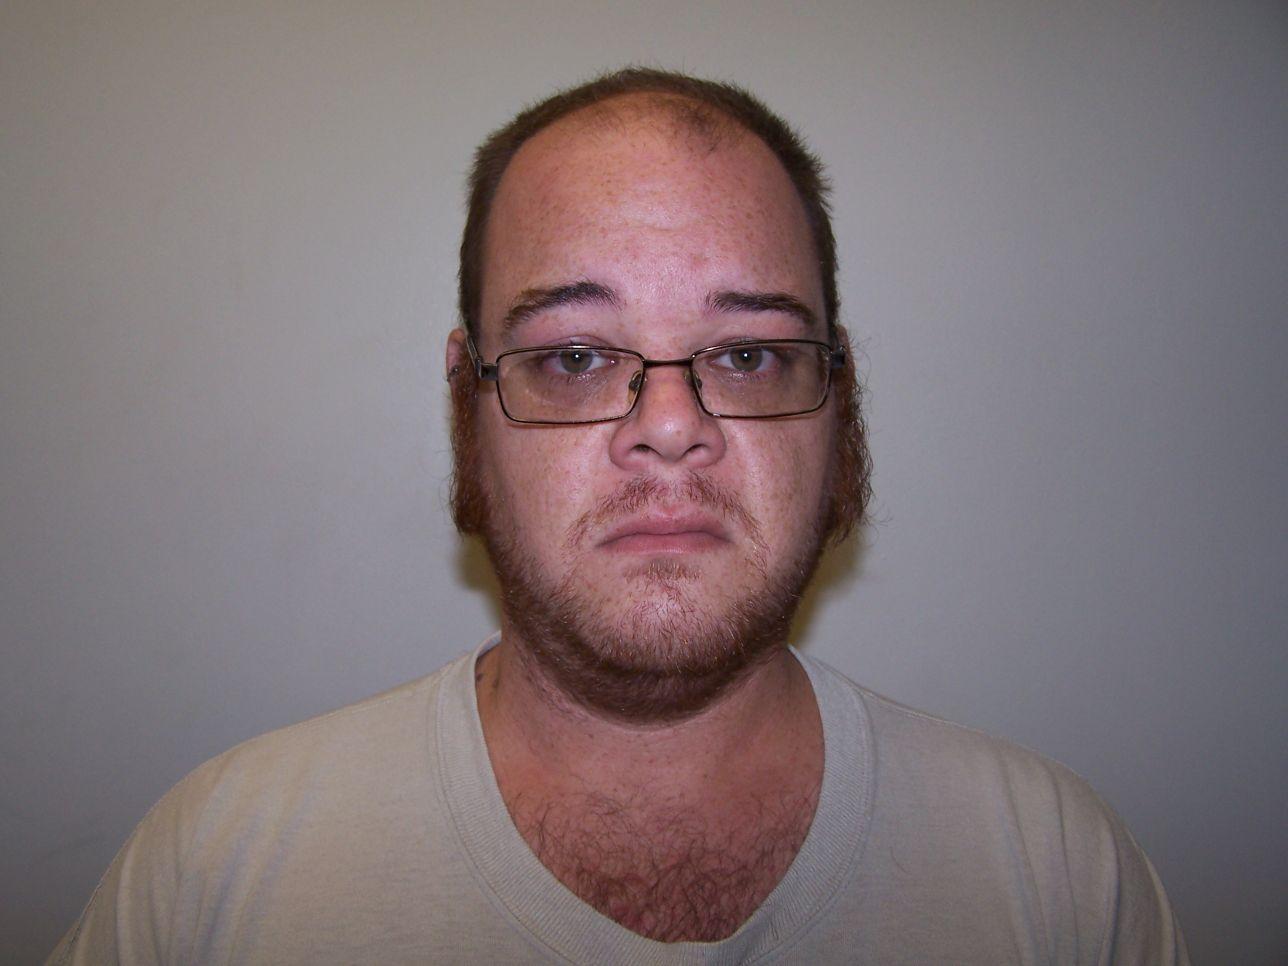 Rehoboth mass sex offender registry